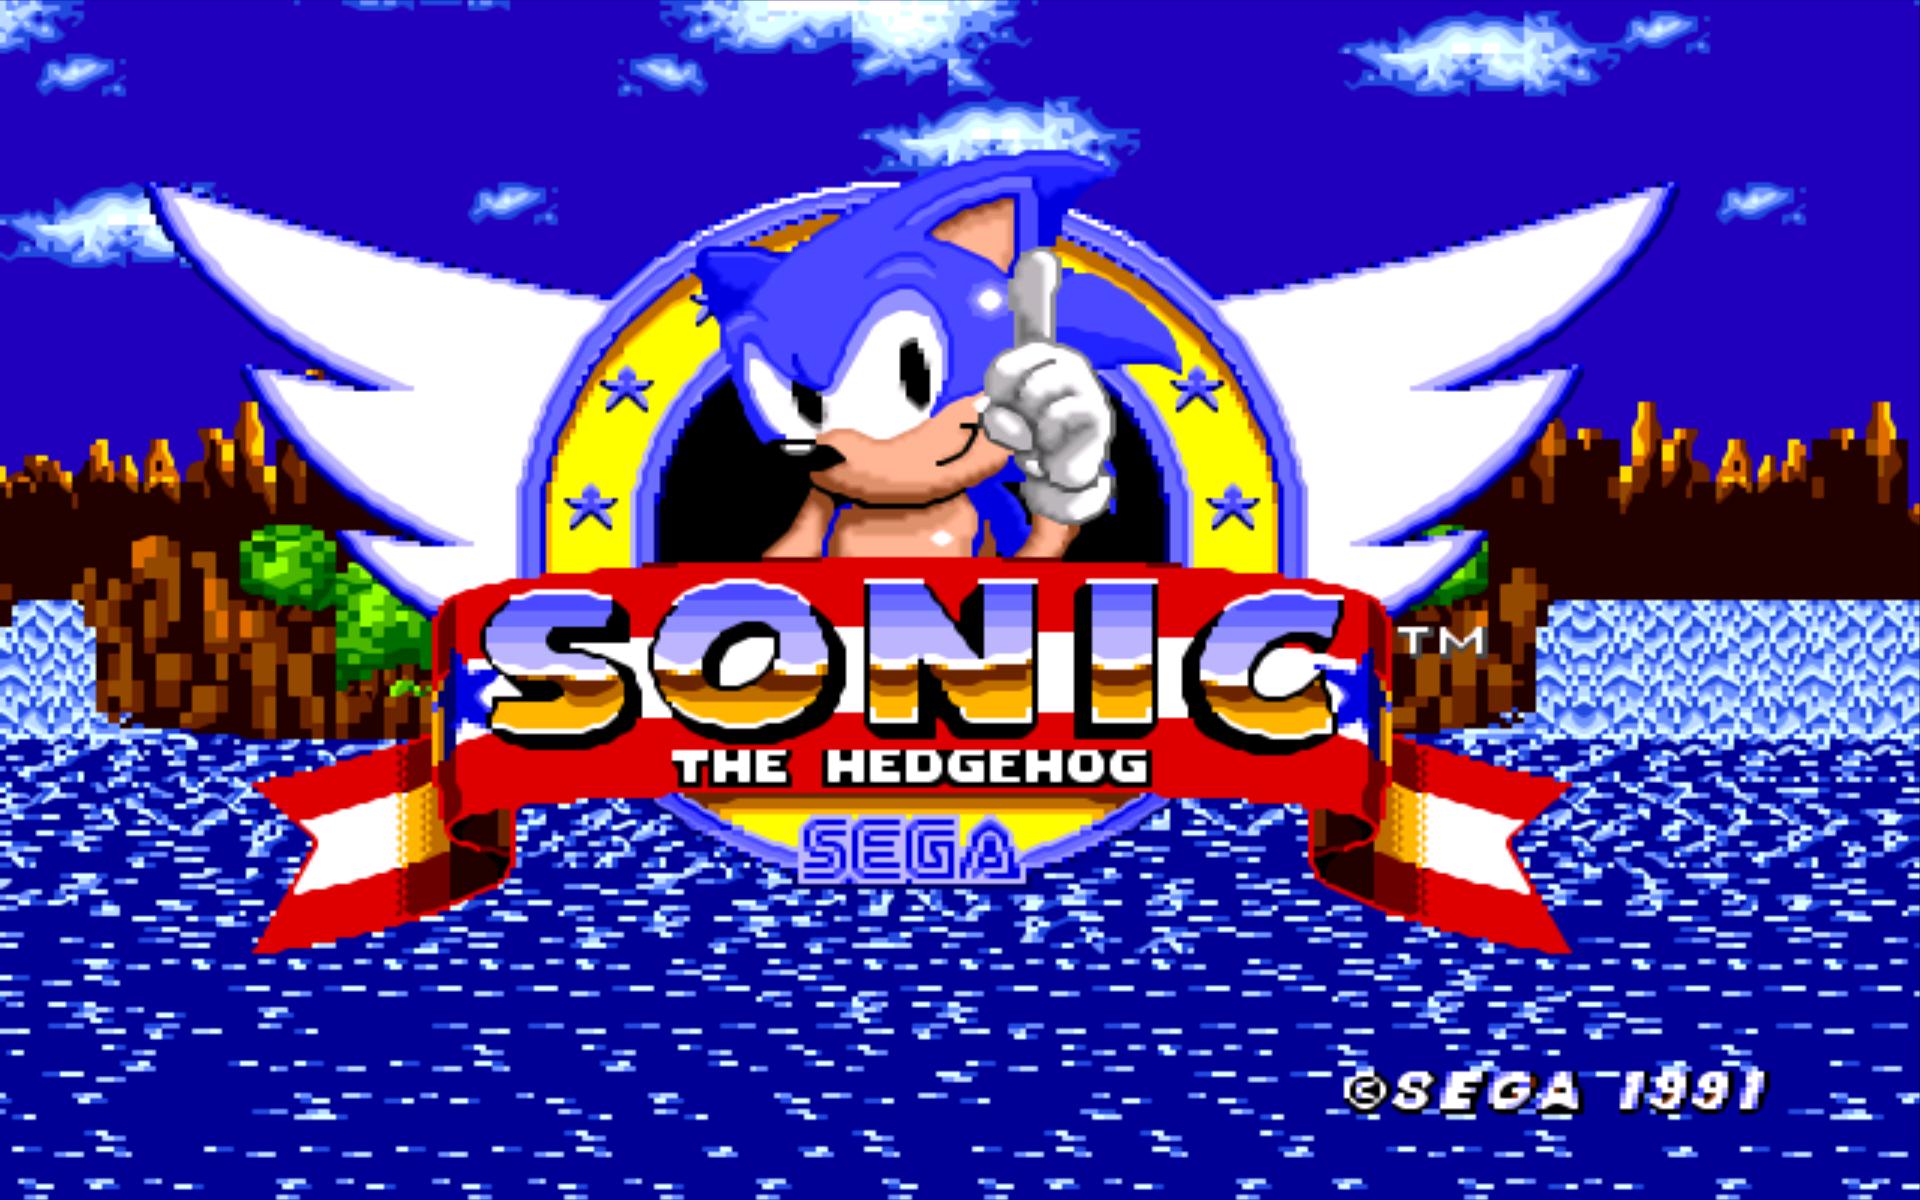 Sonic The Hedgehog 1991 Hd Wallpaper Hintergrund 1920x1200